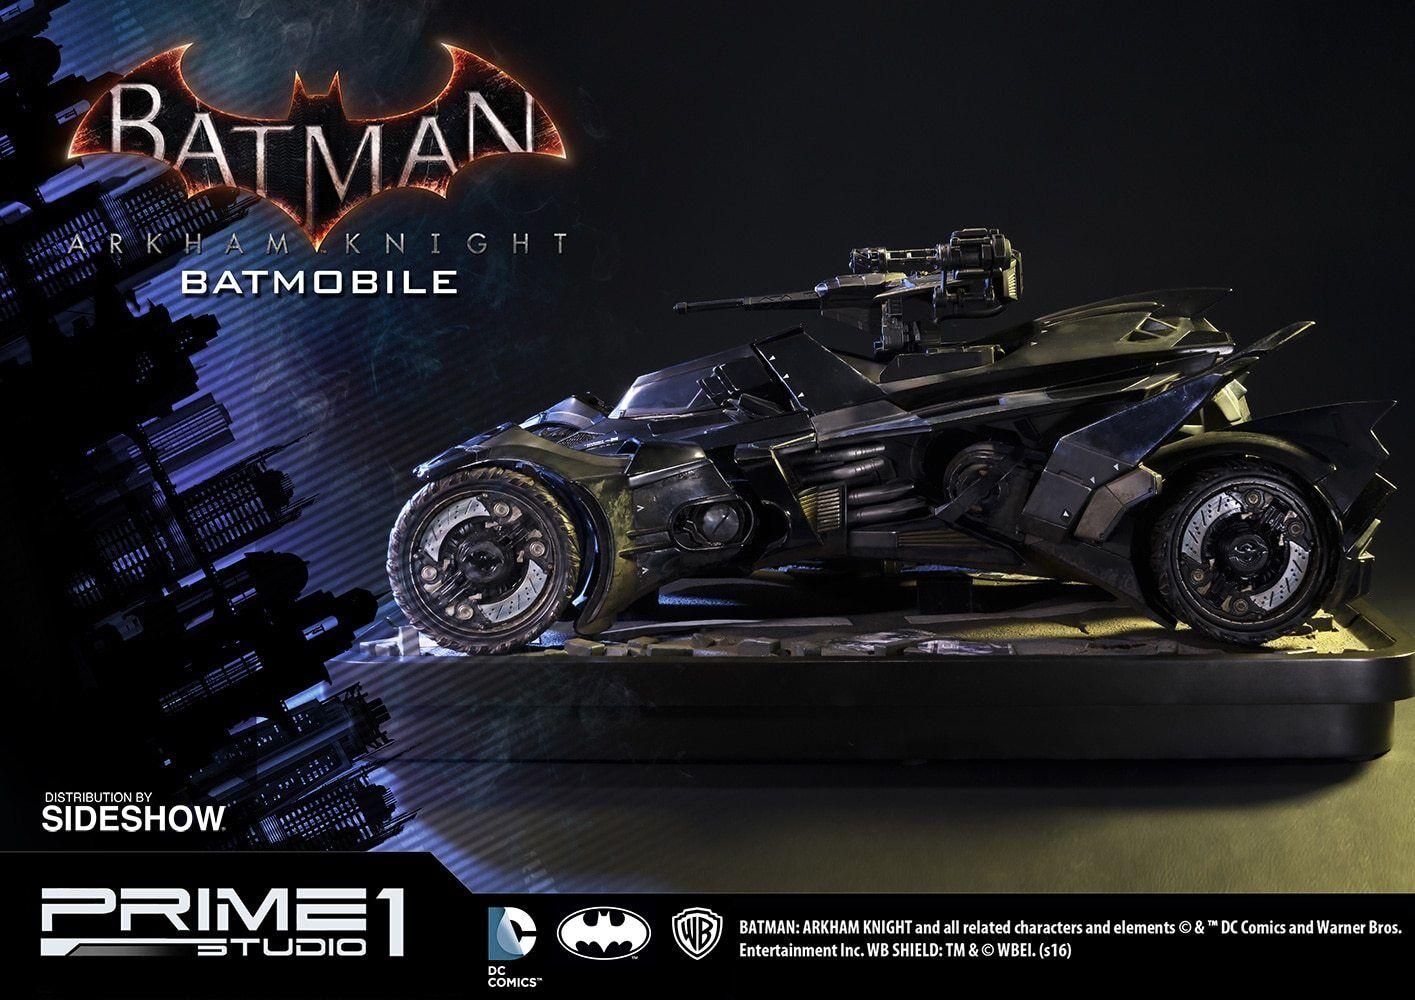 BATuomo Arkham Knight BATMOBILE Polystone Diorama Prime 1 1 1 Studio Sidemostrare Museum 9f13a4